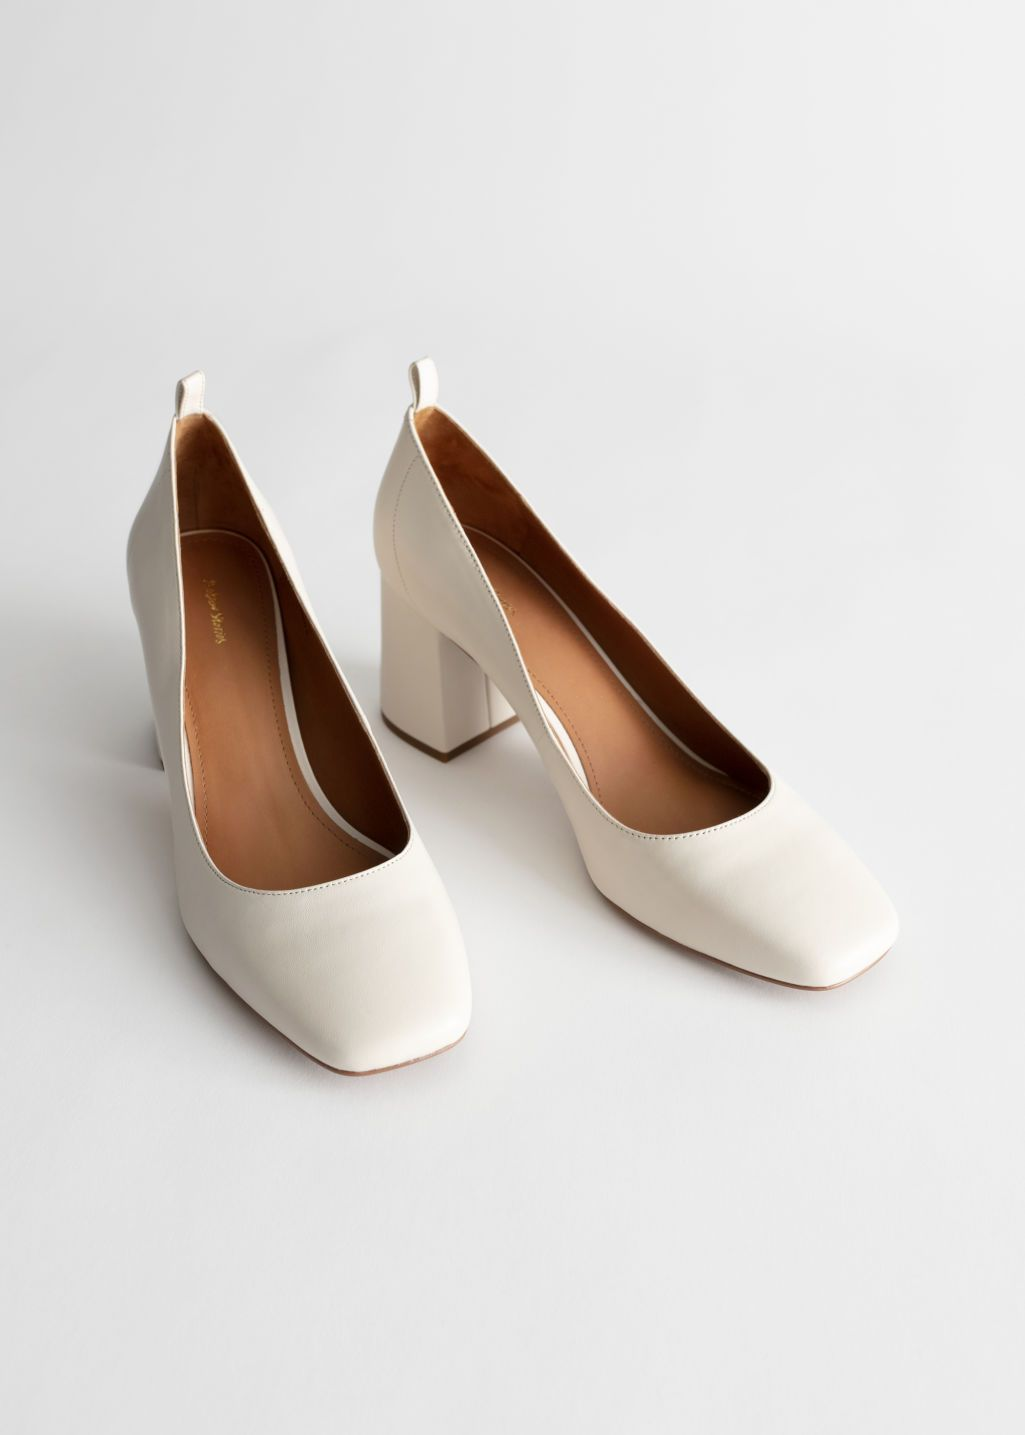 Square Toe Leather Ballerina Pumps in